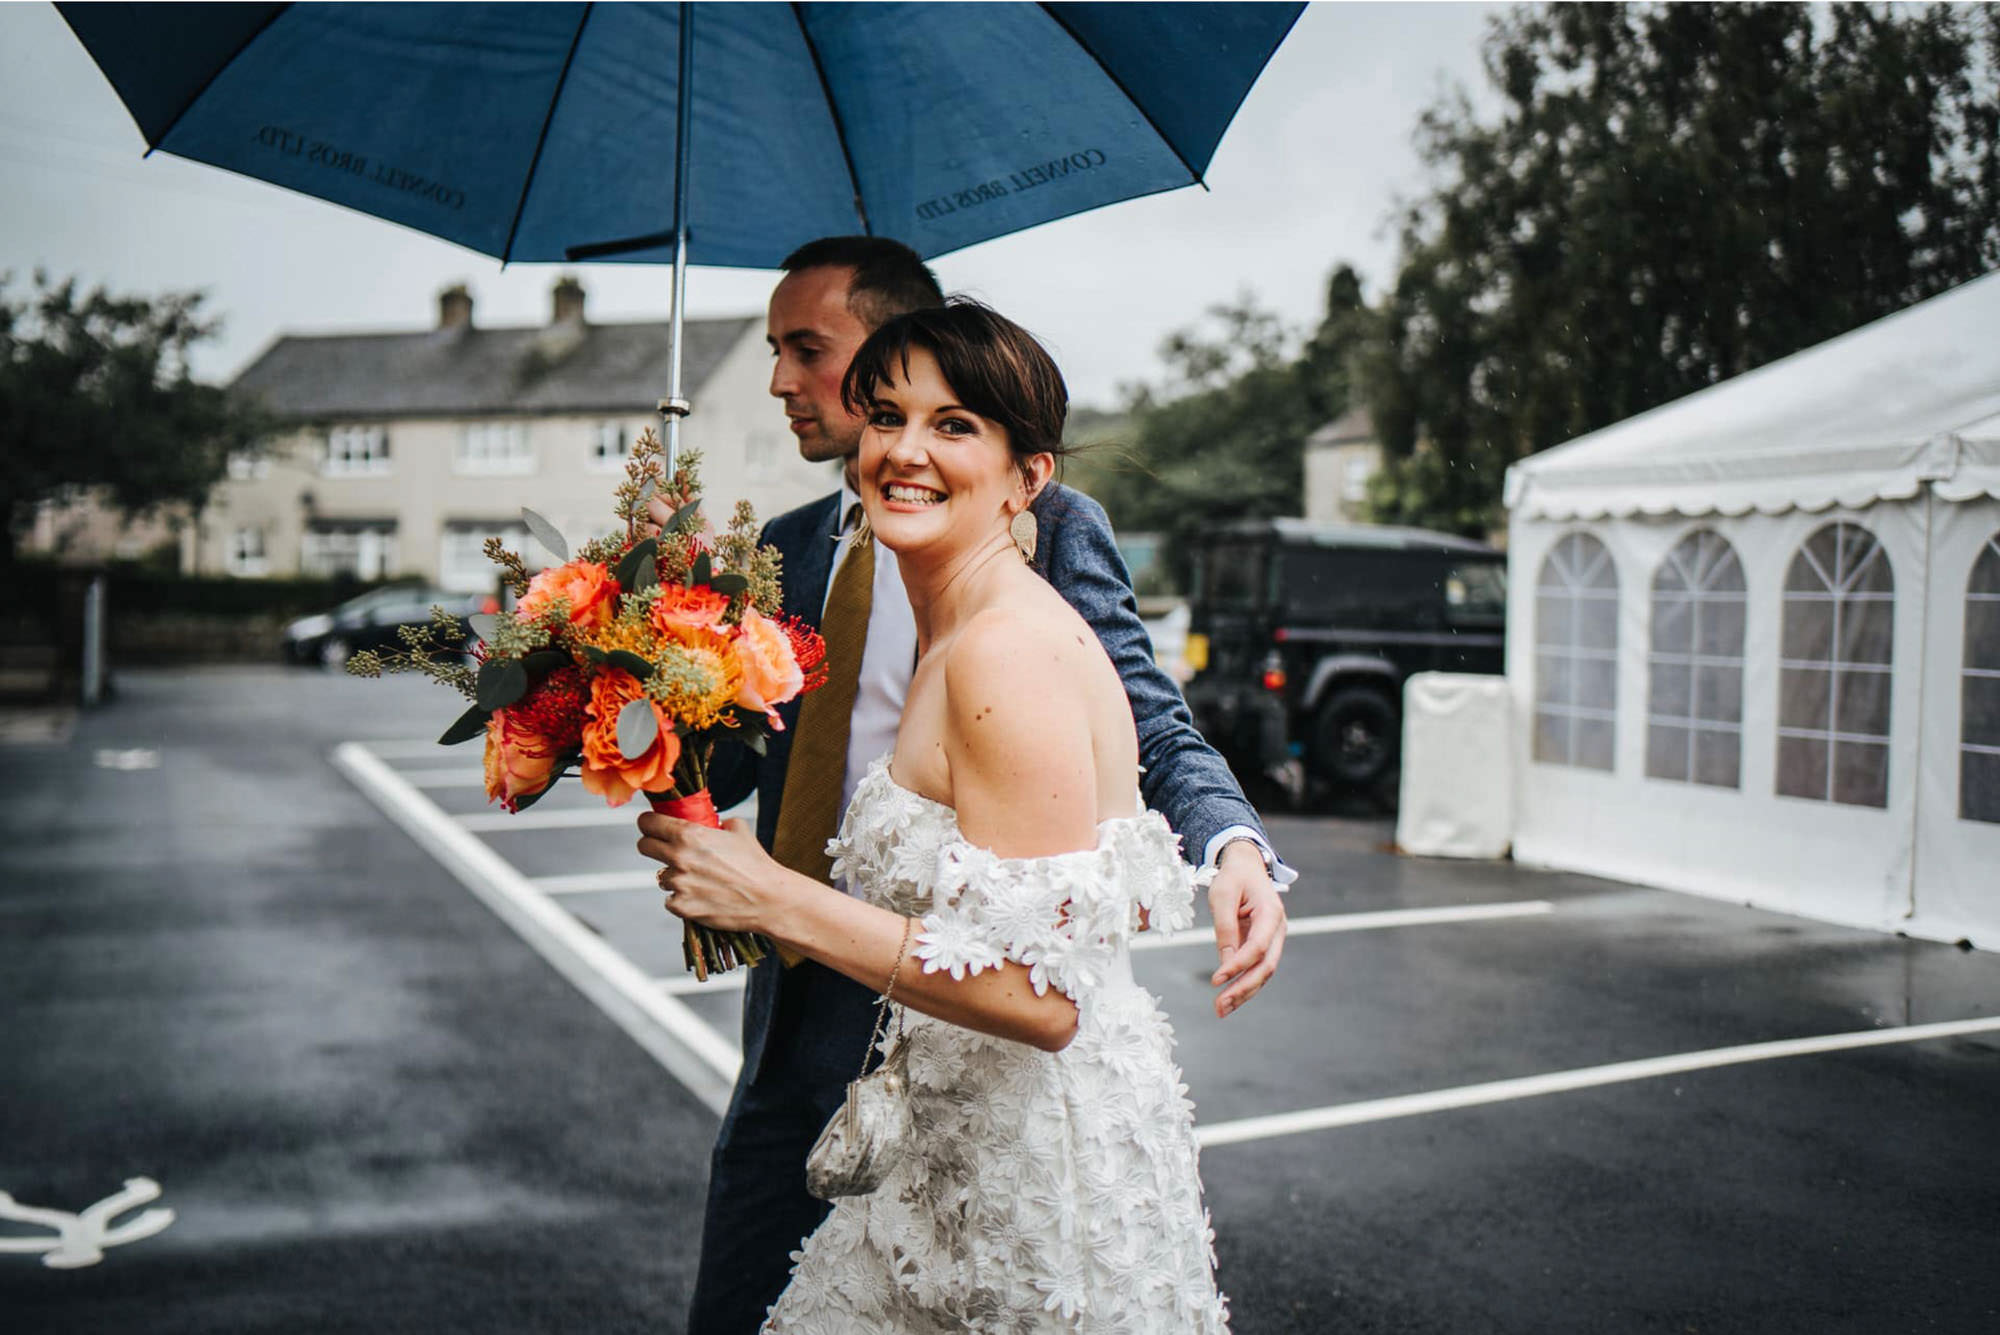 Alastingshot - Creative, Natural Yorkshire Wedding Photography